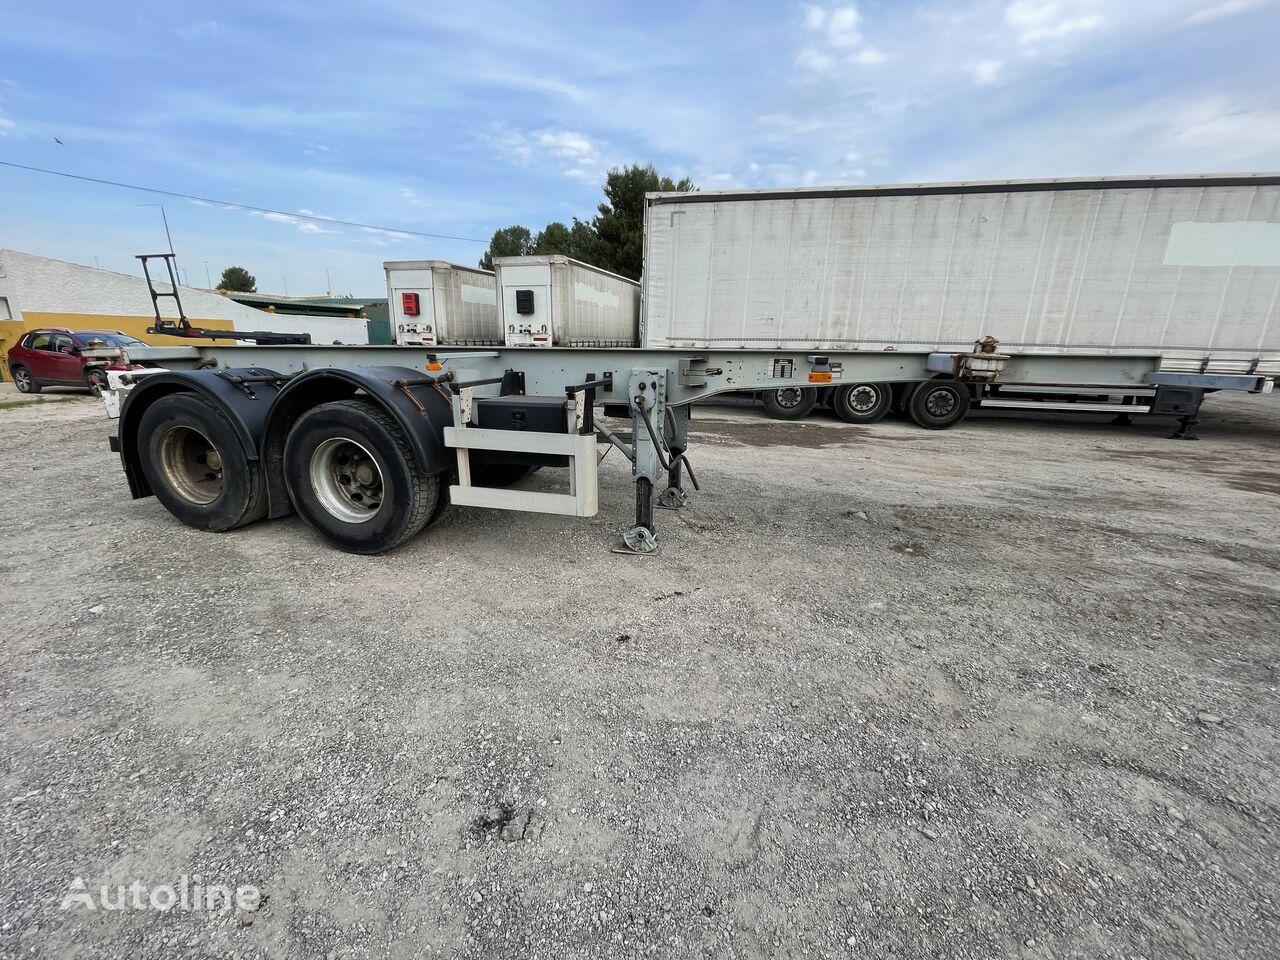 LECINENA Semirremolque Portacontenedor 20 container chassis semi-trailer